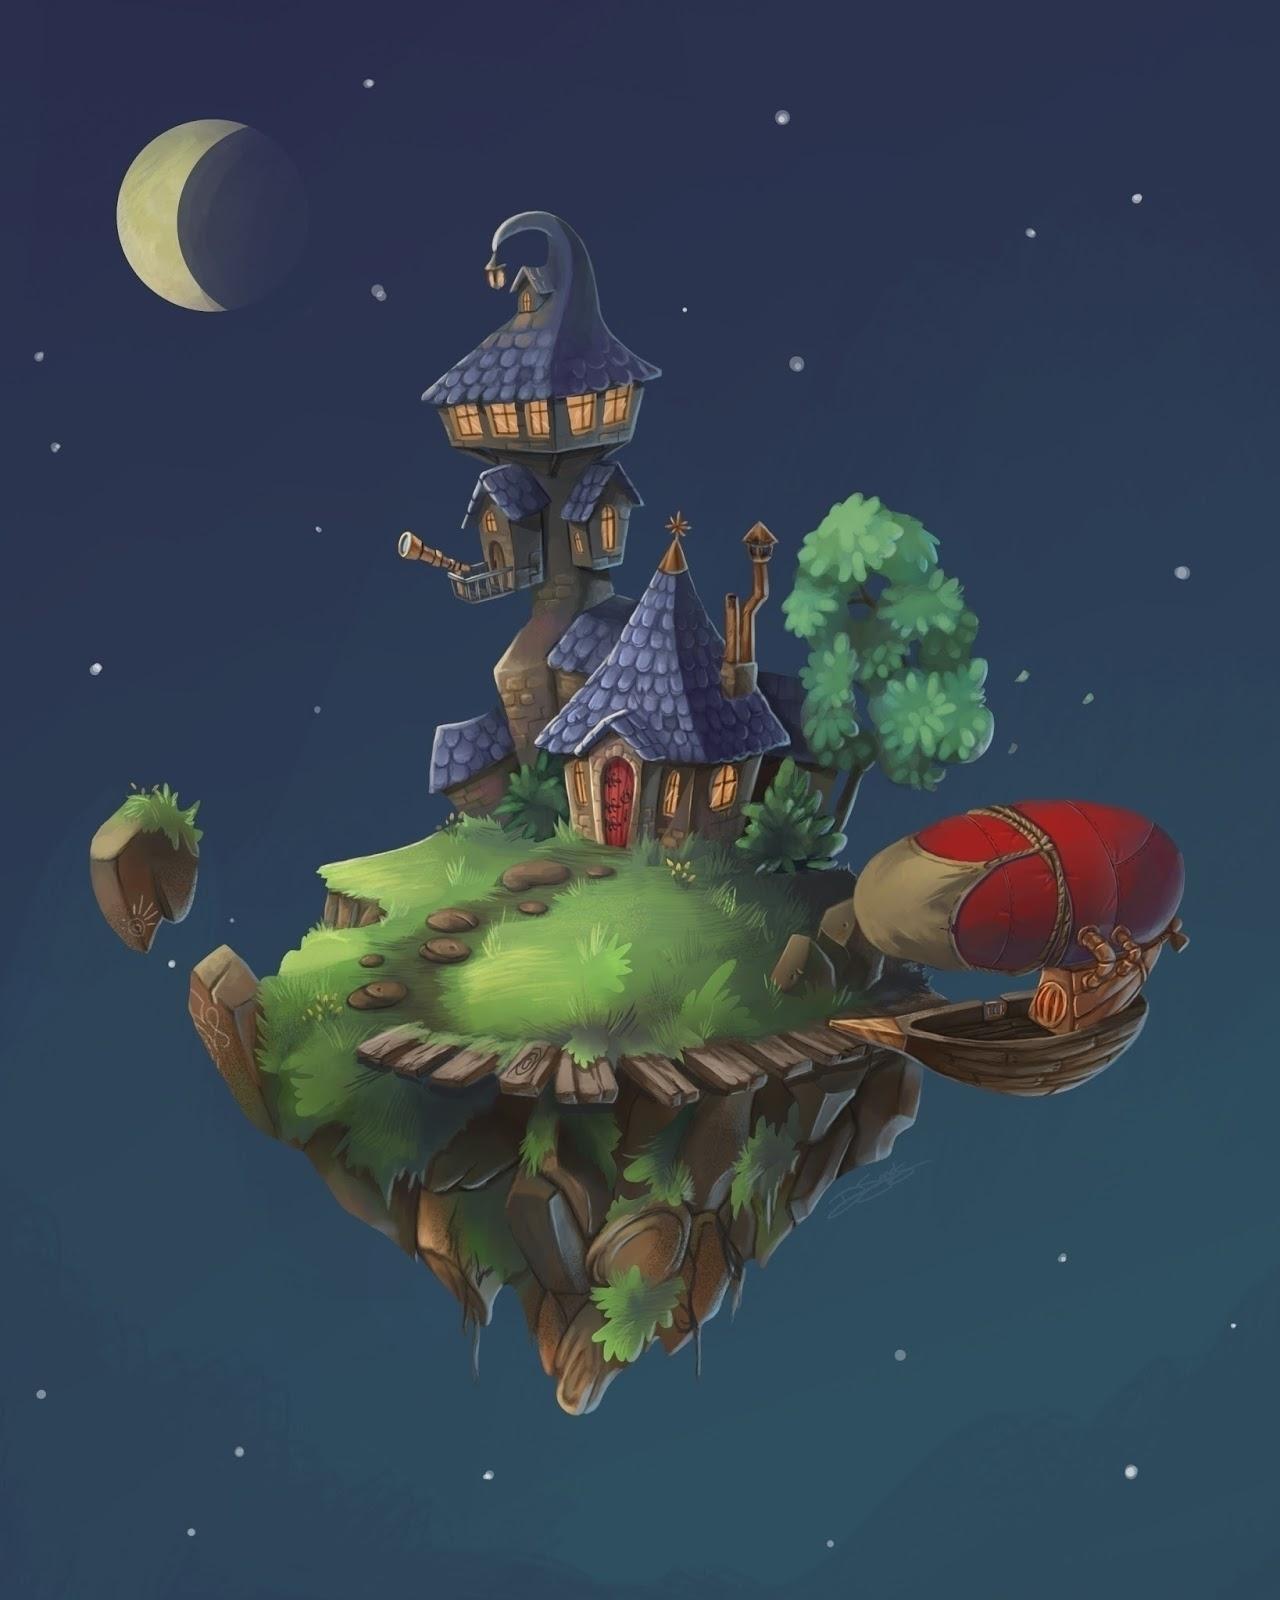 peaceful floating island - illustration - sketchingsands | ello